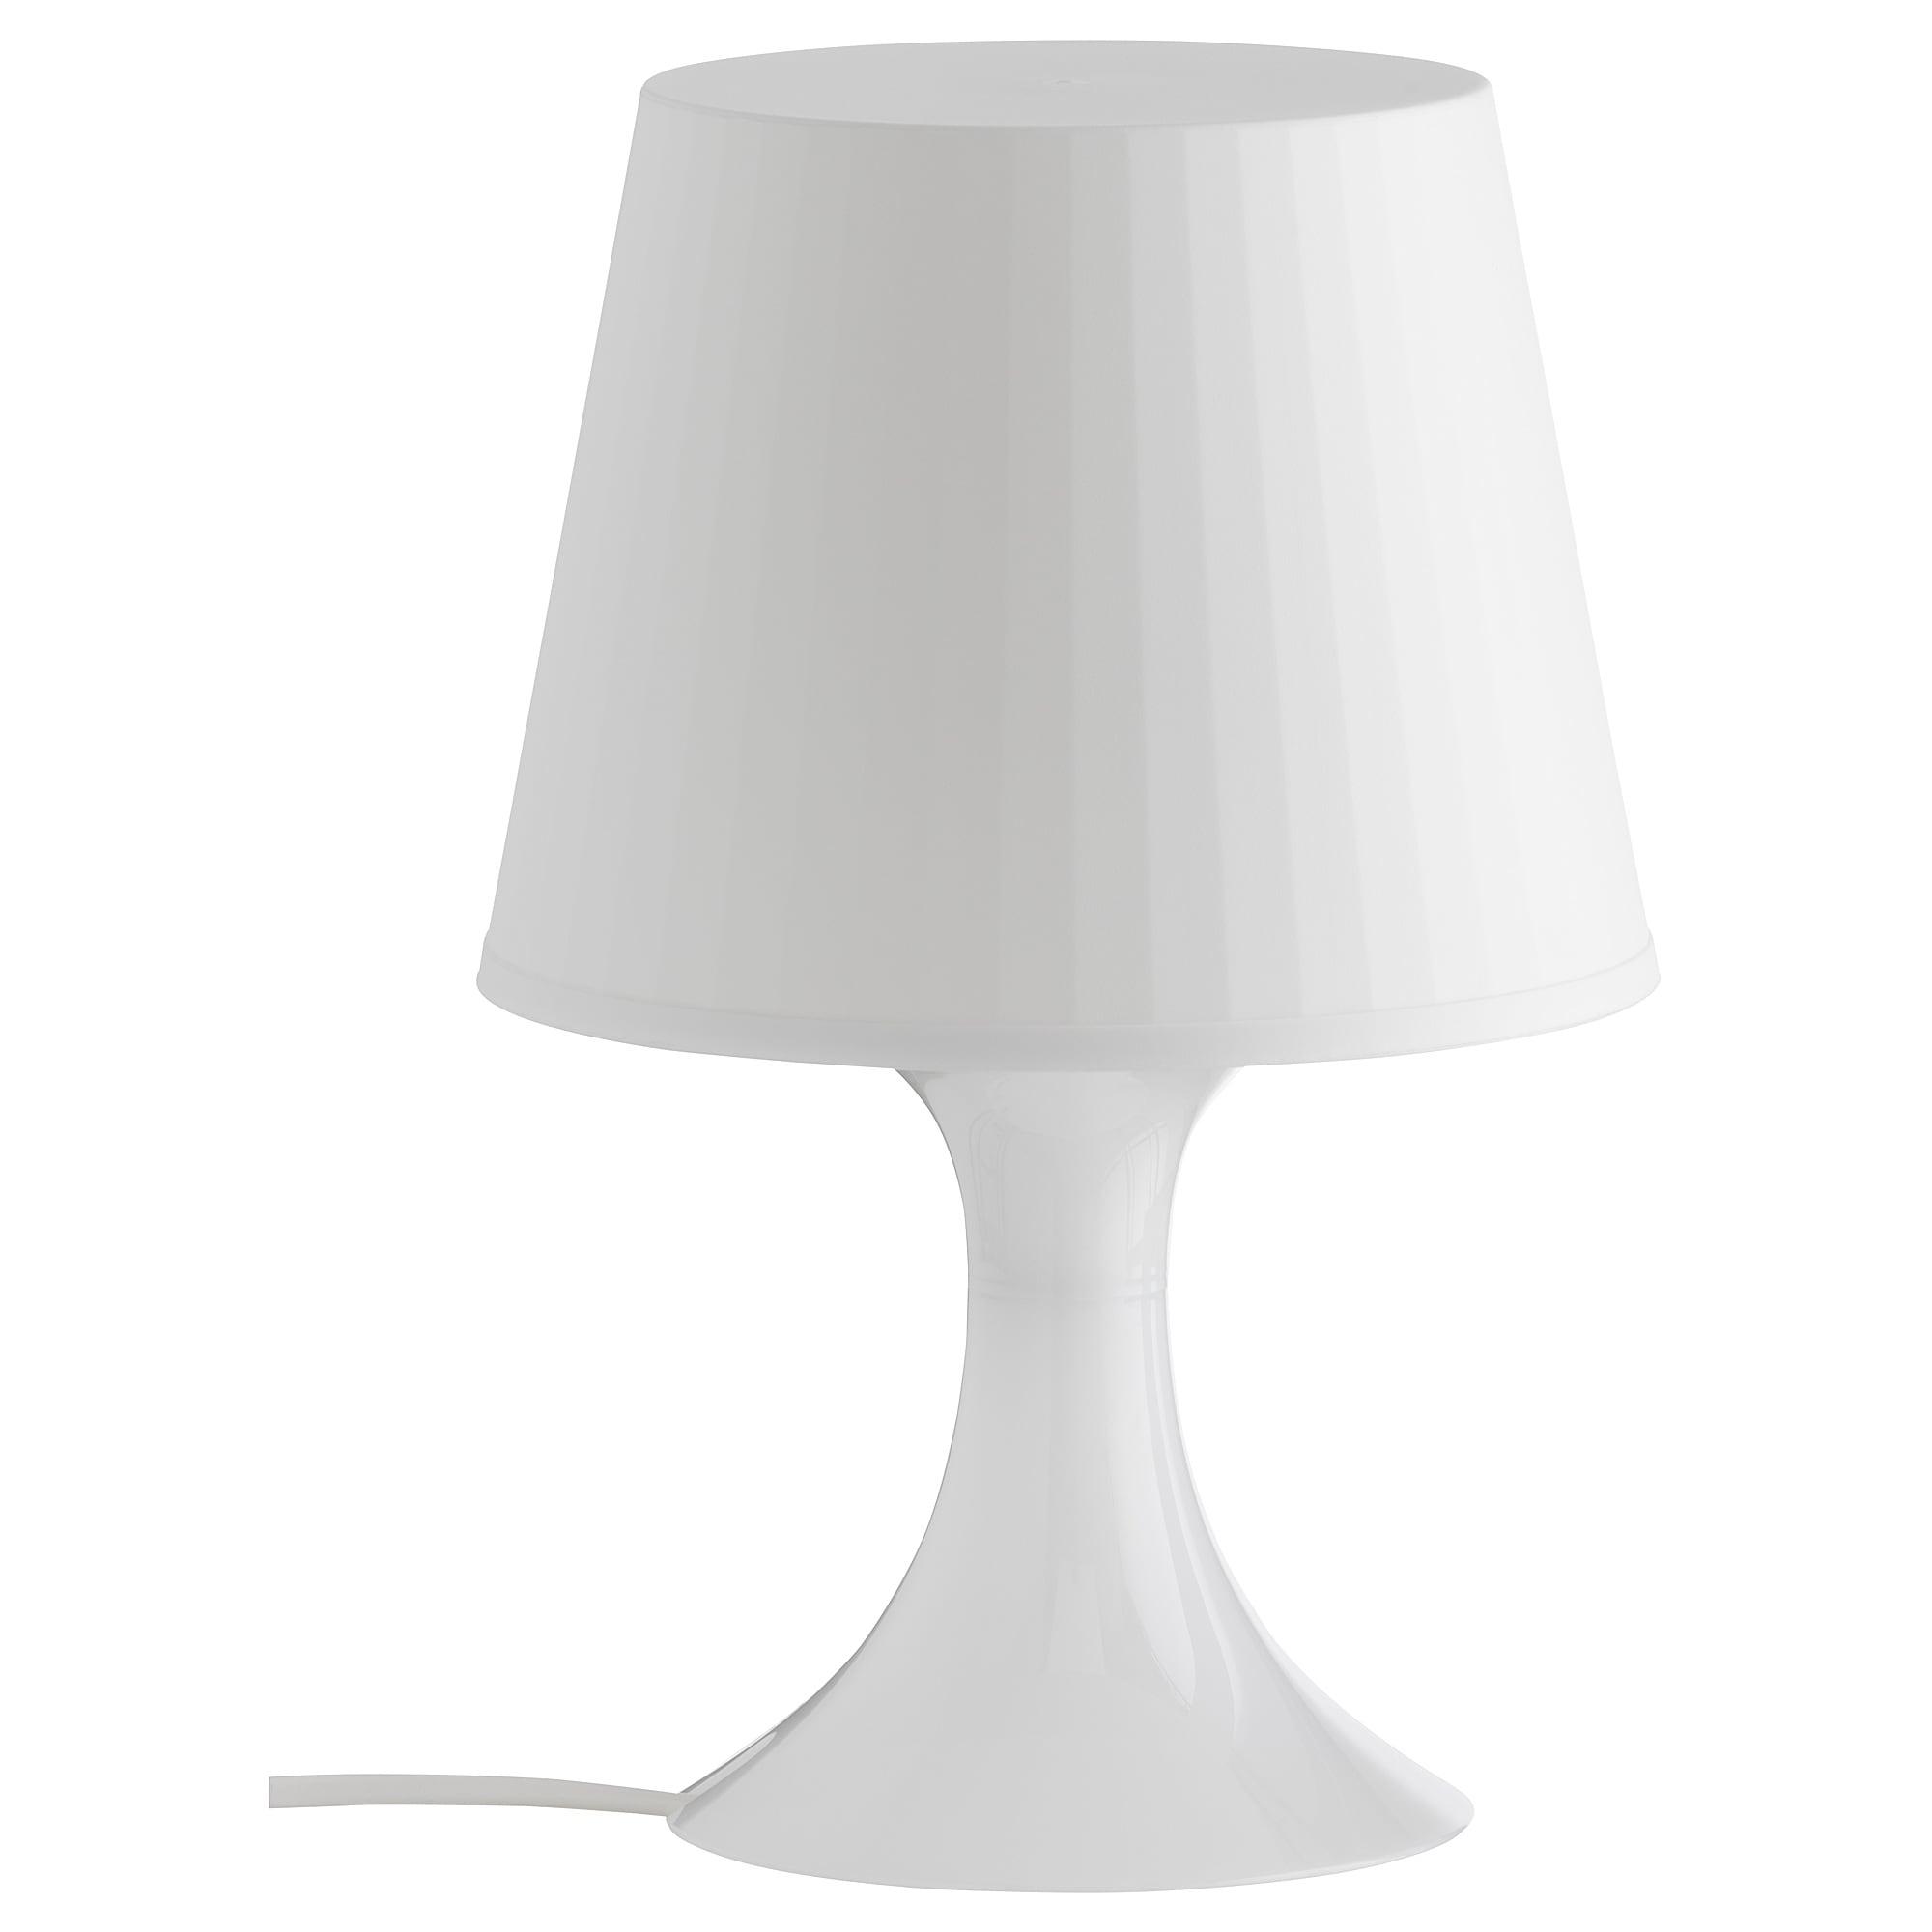 Ikea Lampara Mesa Gdd0 Lampan LÃ Mpara De Mesa Blanco Ikea